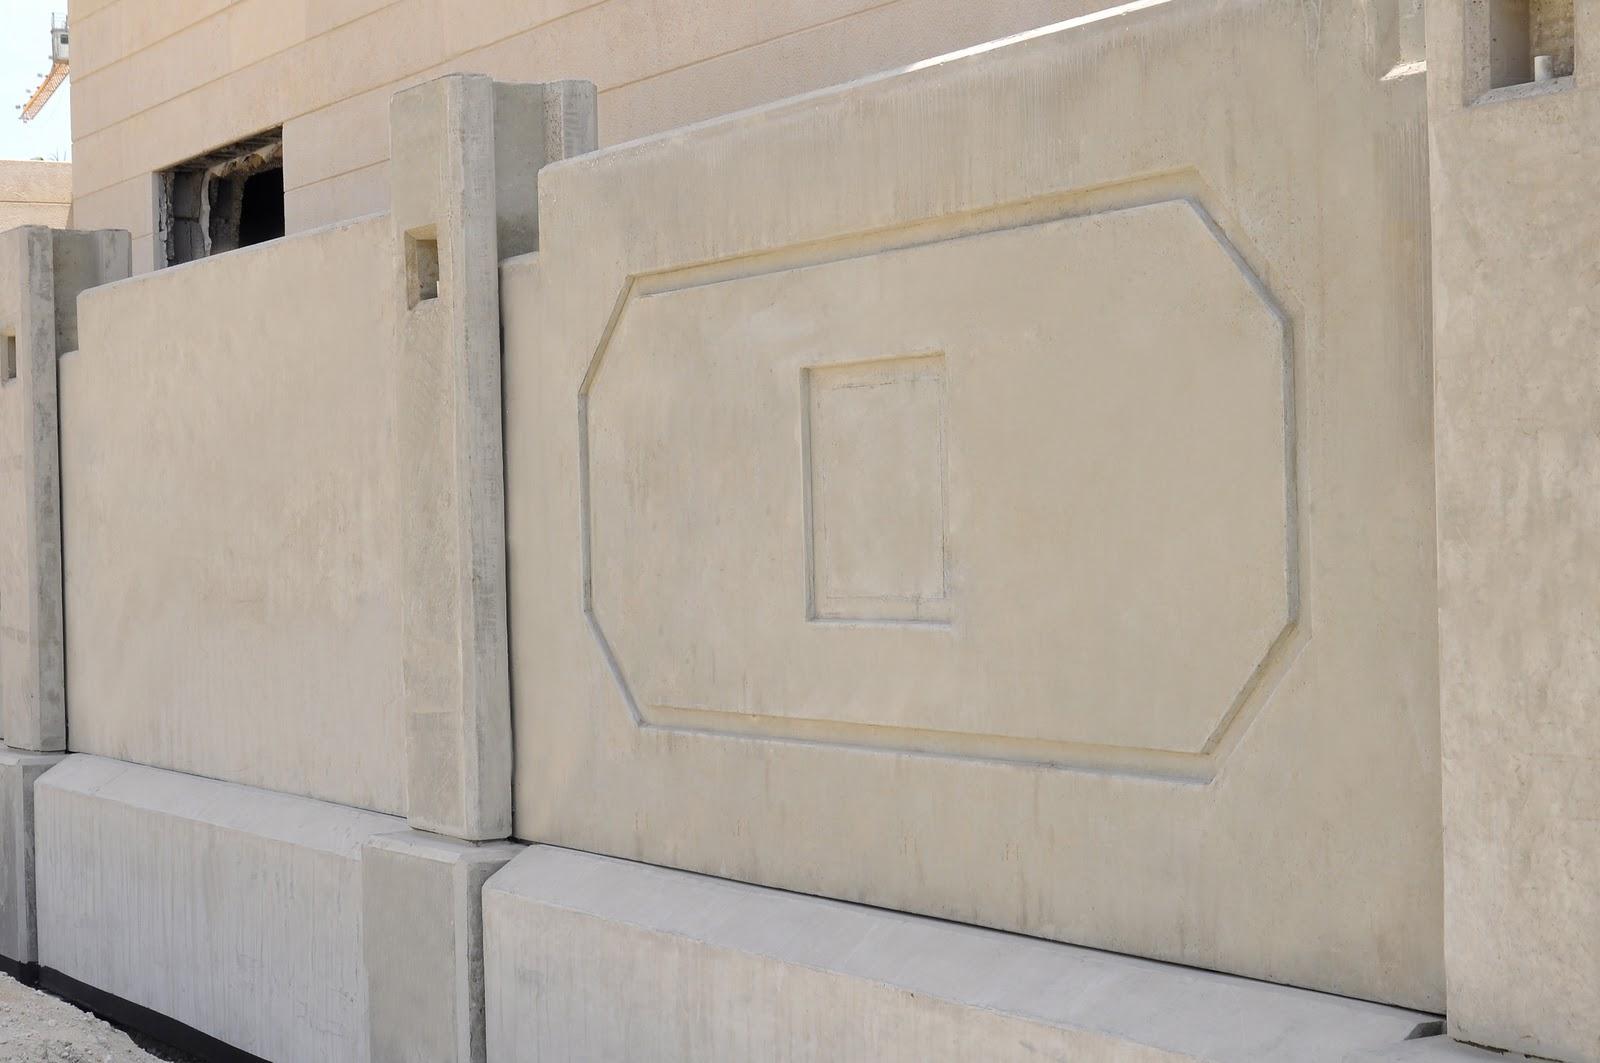 Concrete Baffle Wall Design : Precast concrete wall panel design